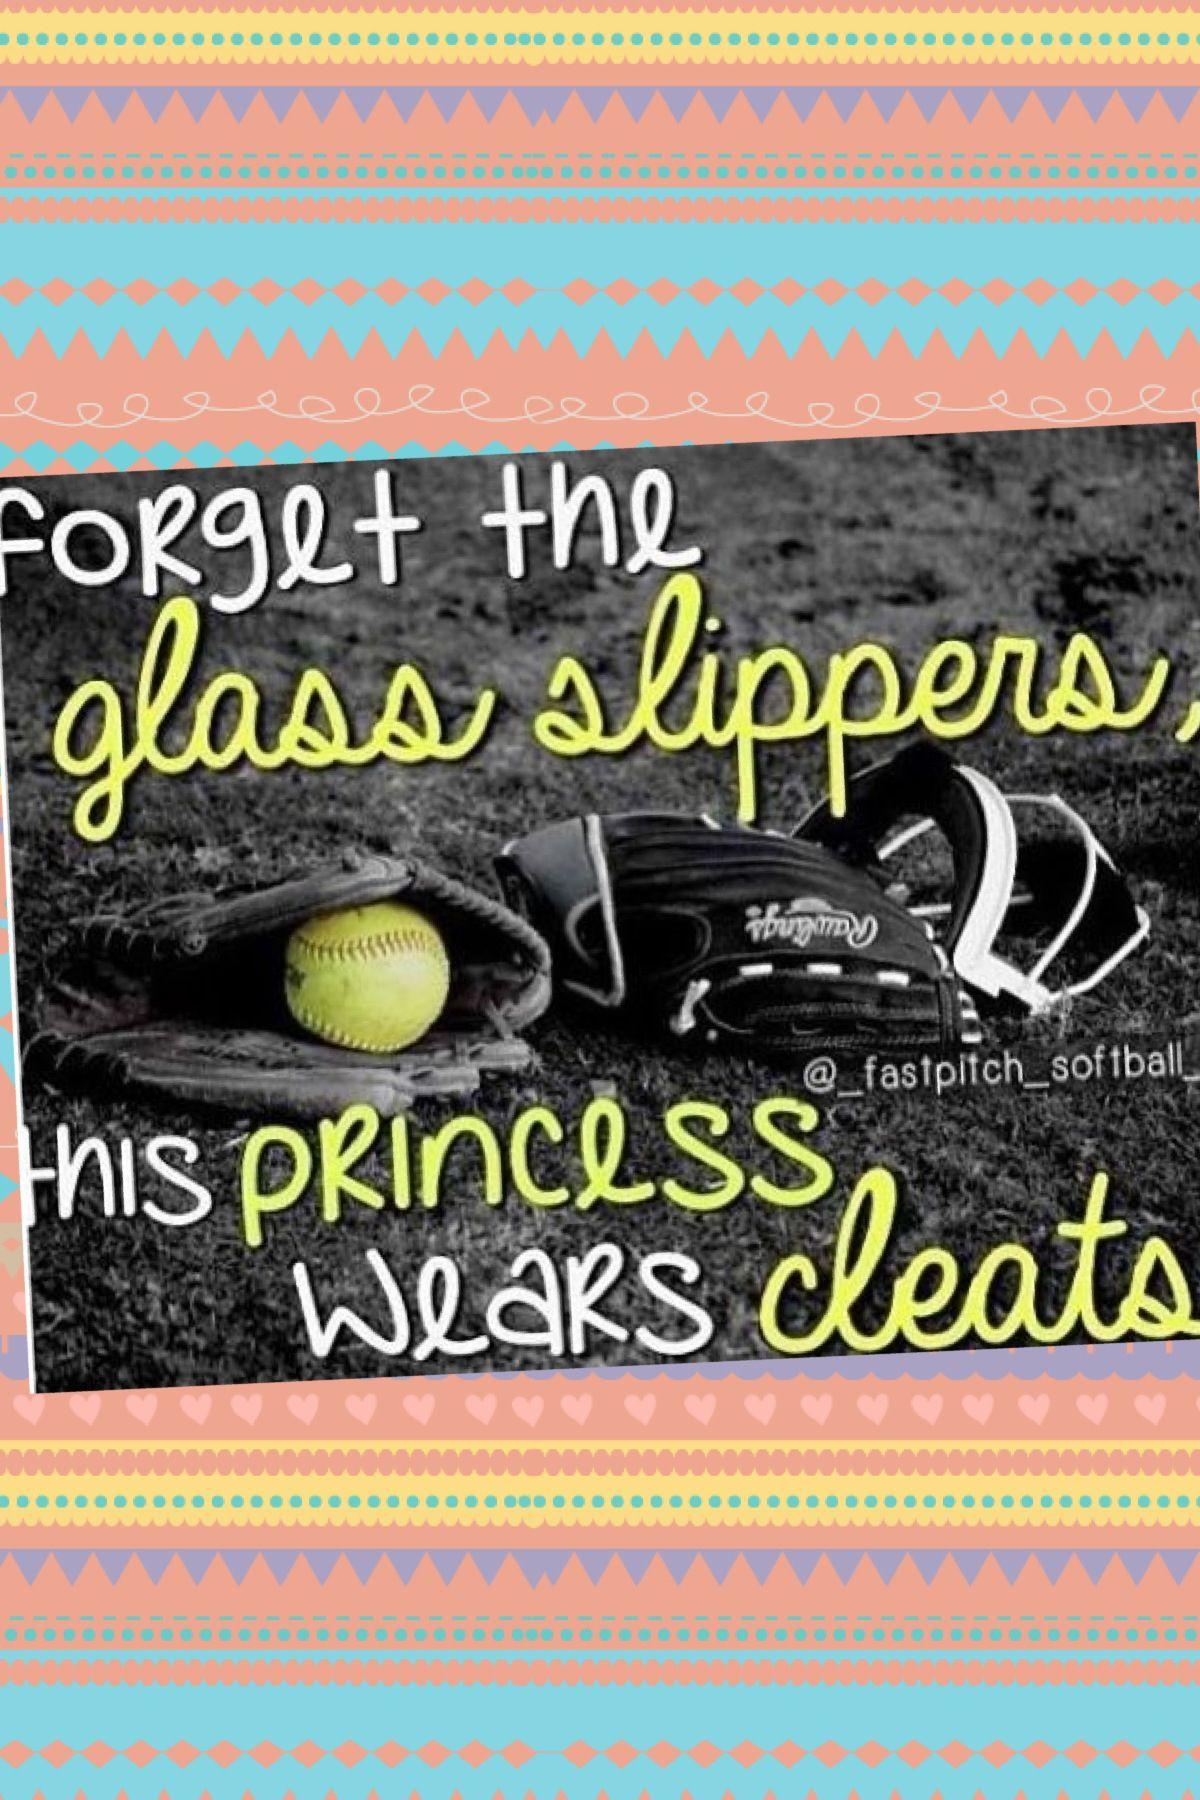 softball quotes desktop wallpaper - photo #9